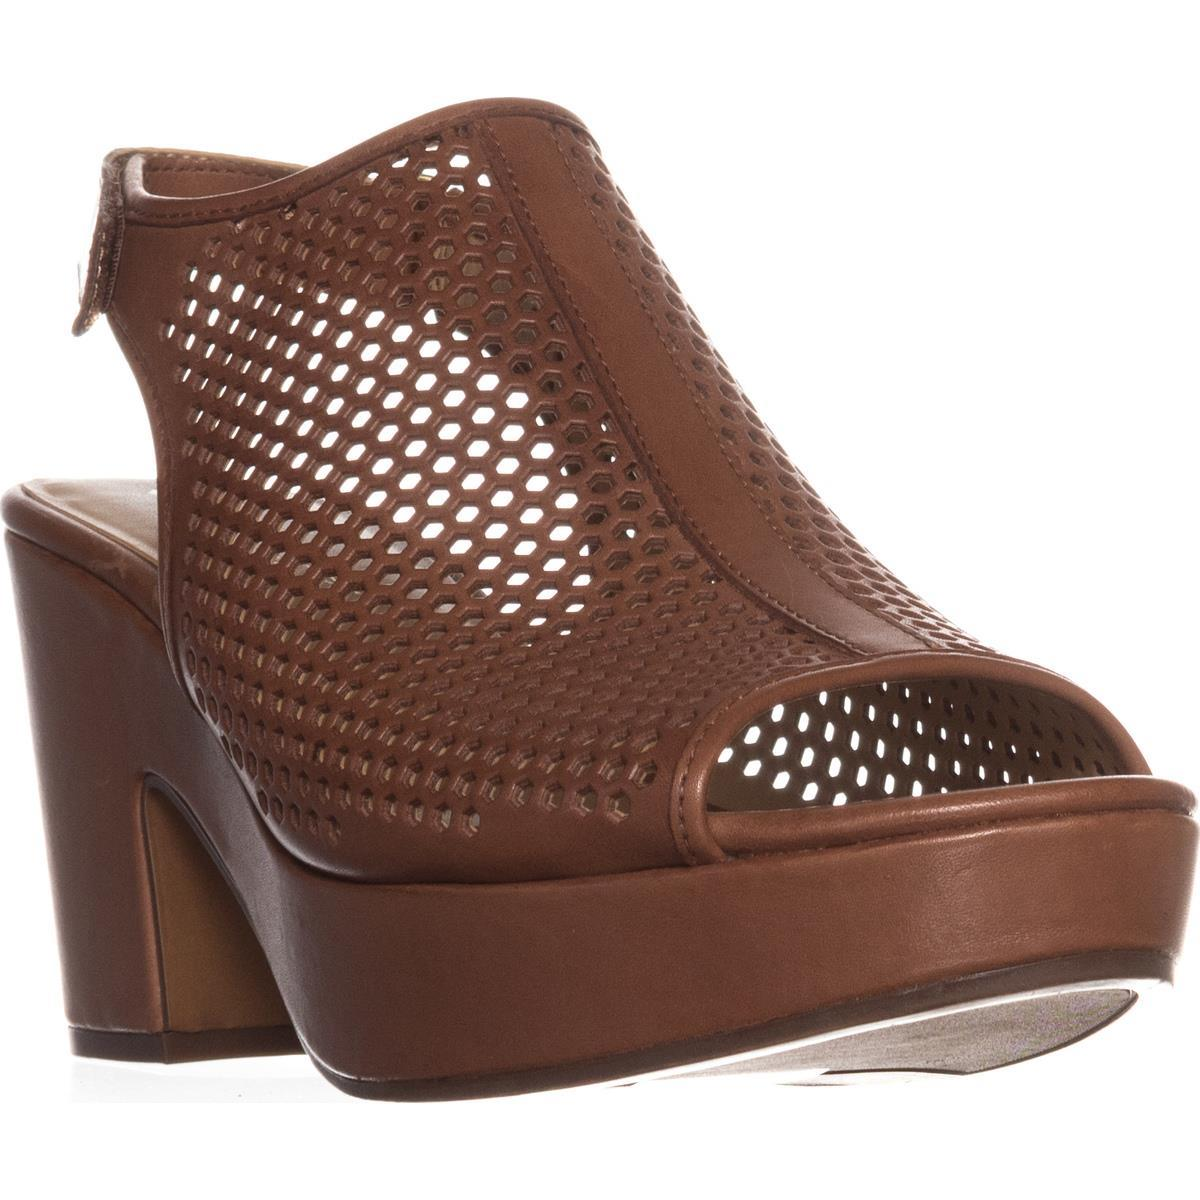 Womens Naturalizer Ella Platform Wedge Sandals, Saddle Tan by Naturalizer